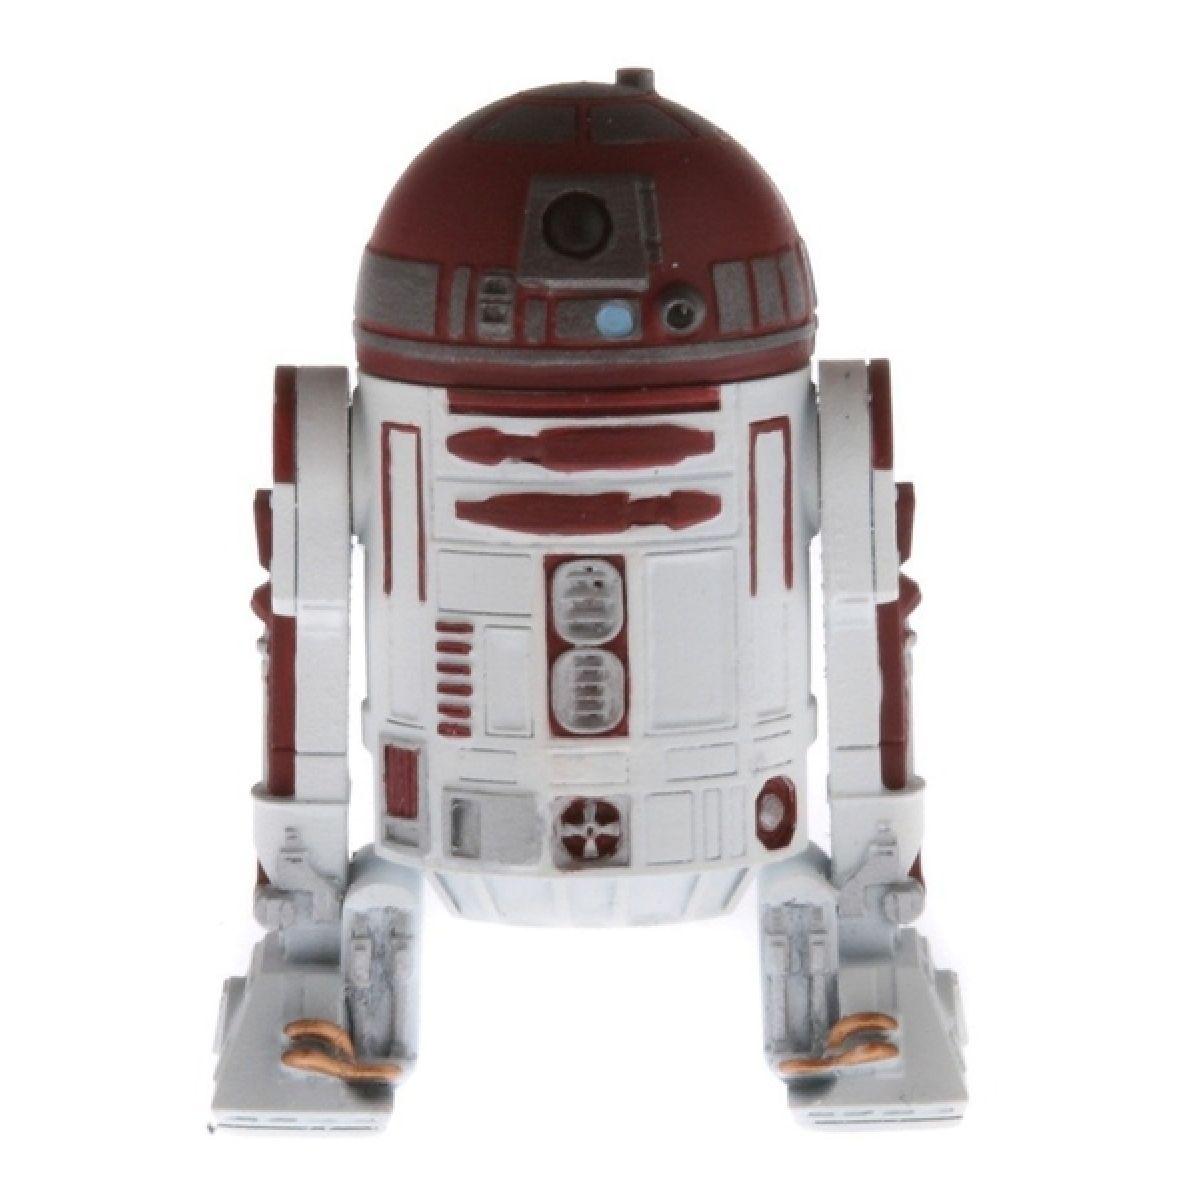 Hasbro Star Wars akční figurky - R4-P17